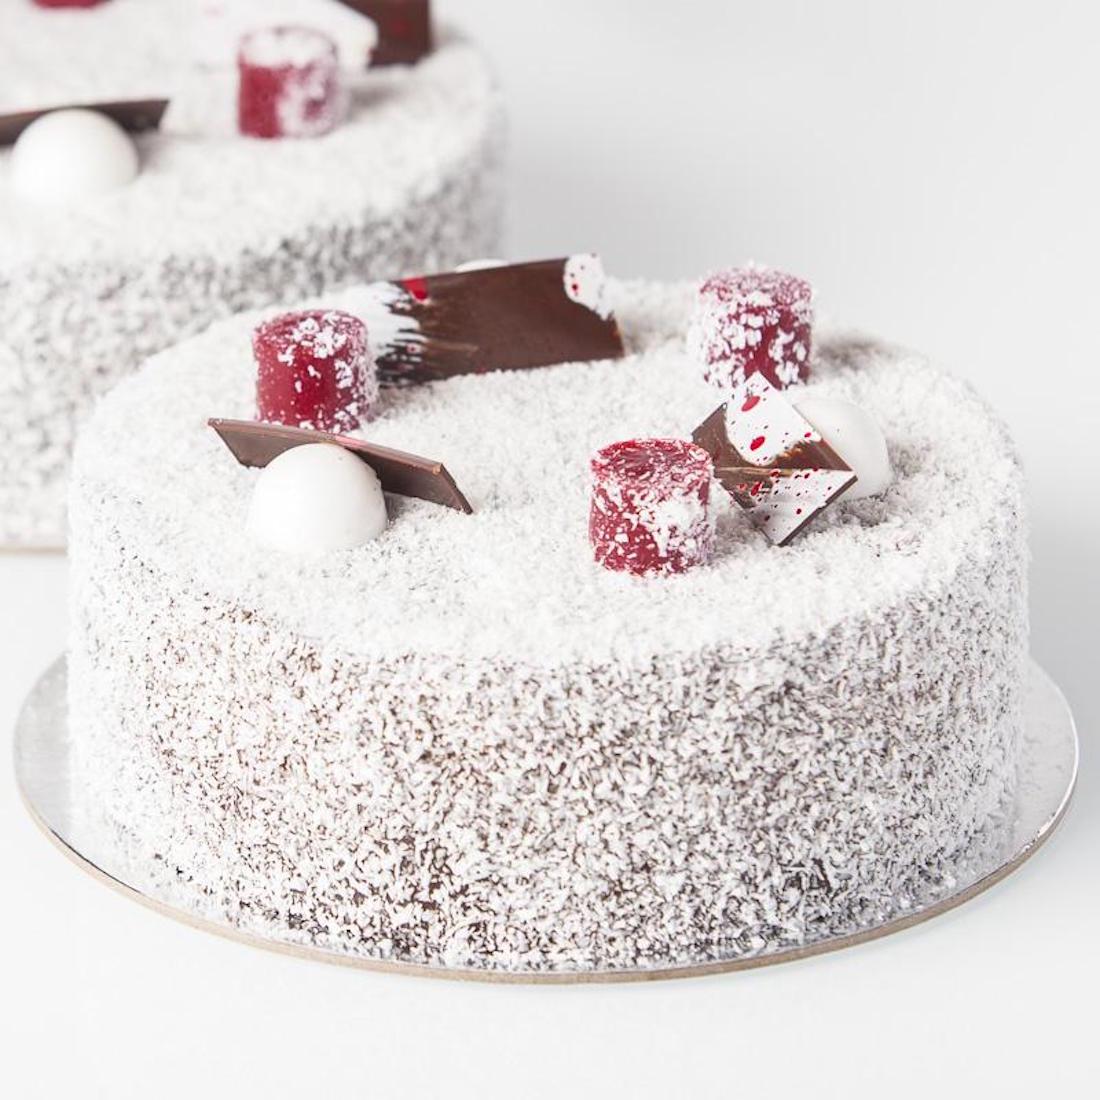 A lamington cake sits atop silver foil.